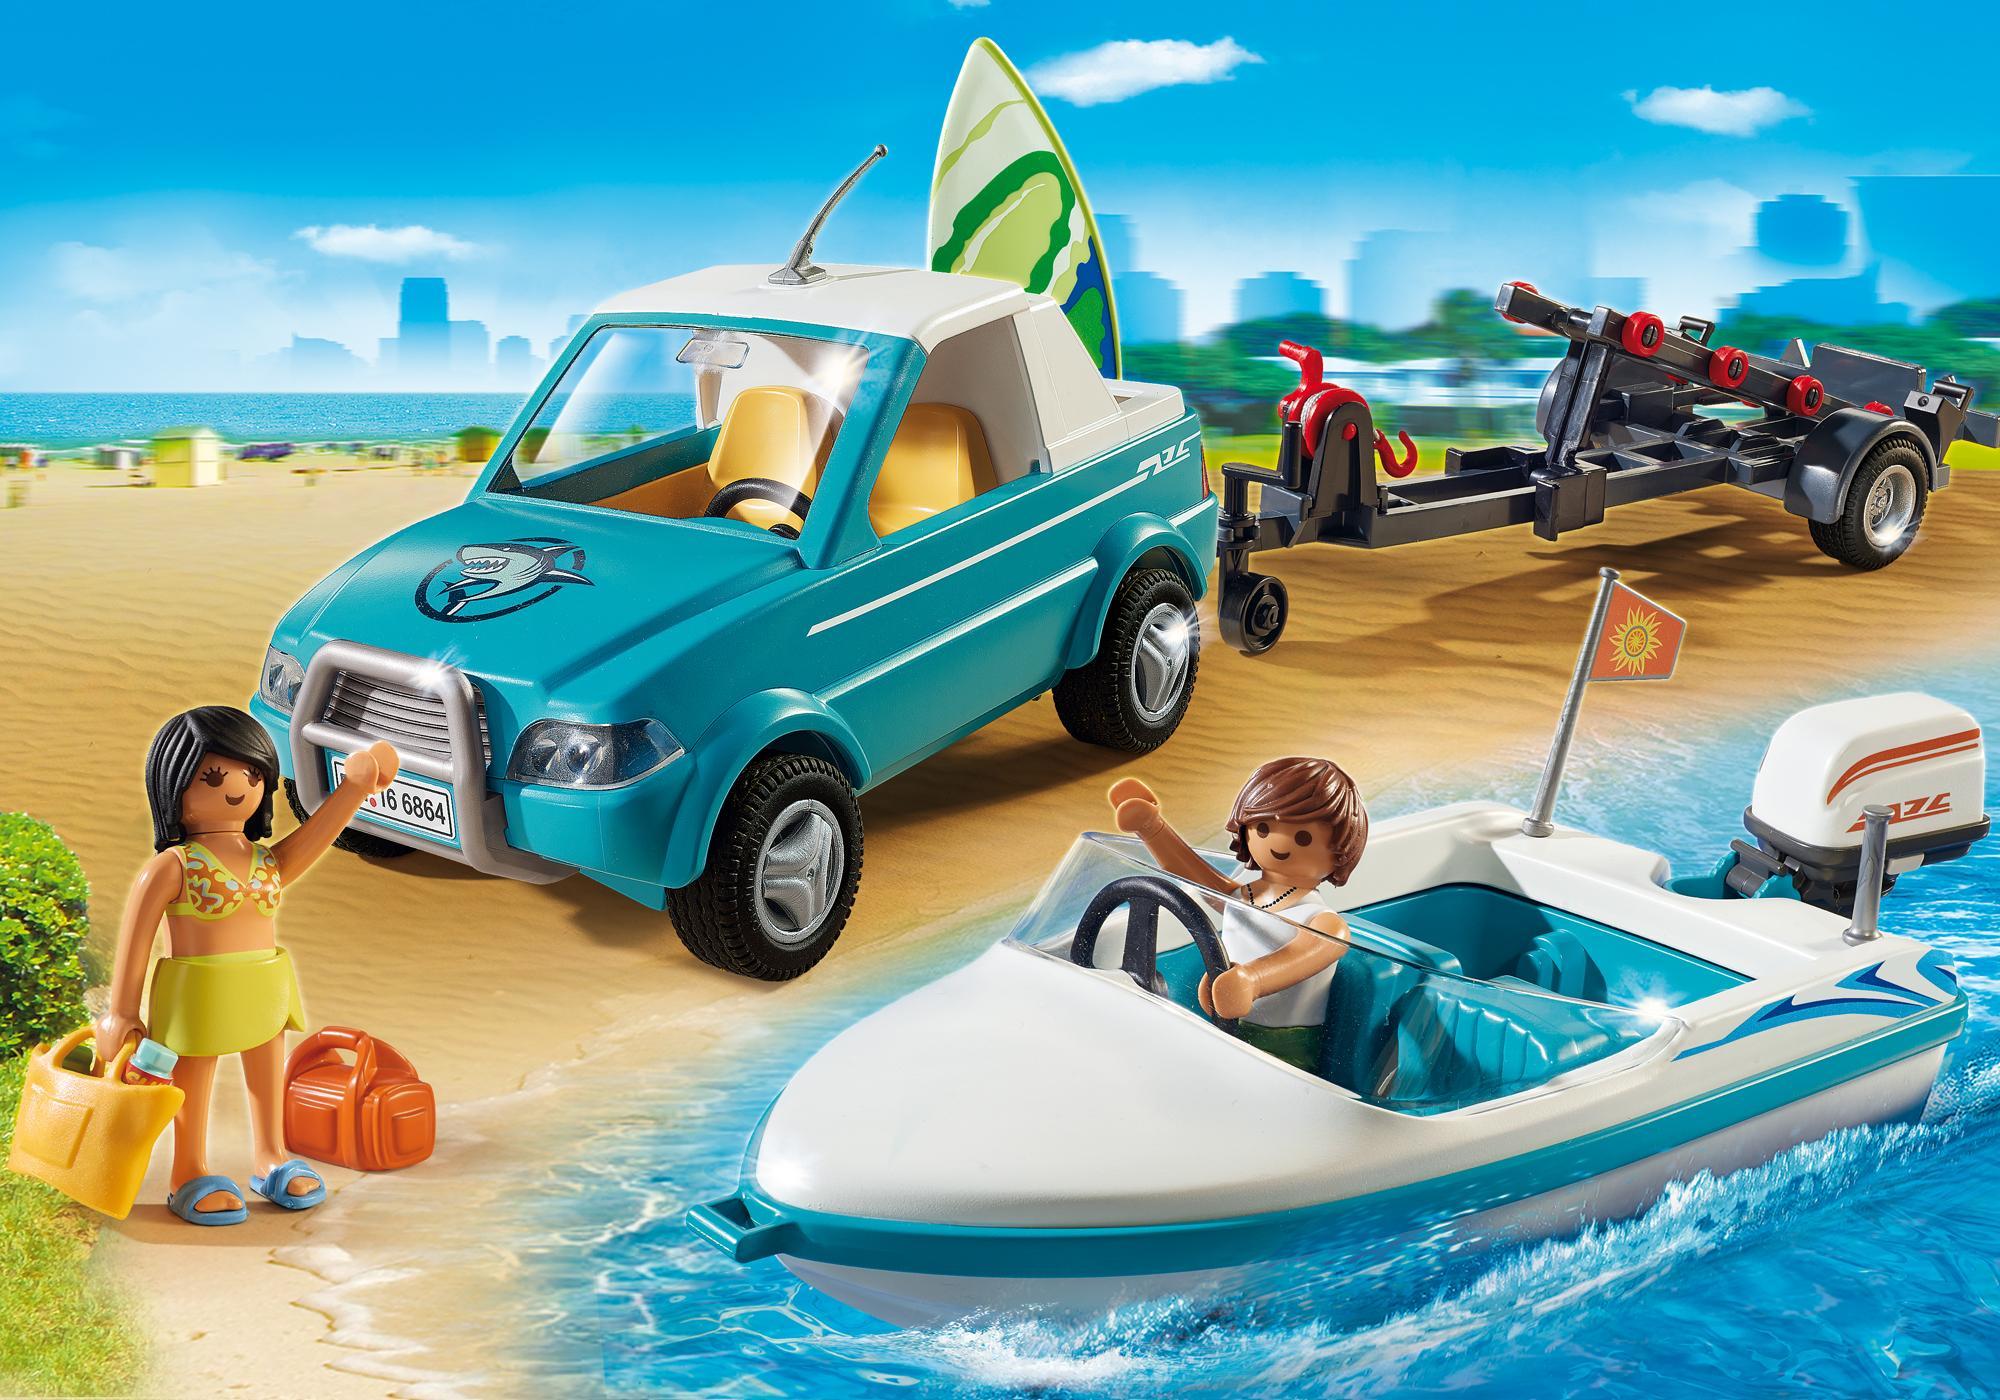 http://media.playmobil.com/i/playmobil/6864_product_detail/Pick-up met speedboot met onderwatermotor